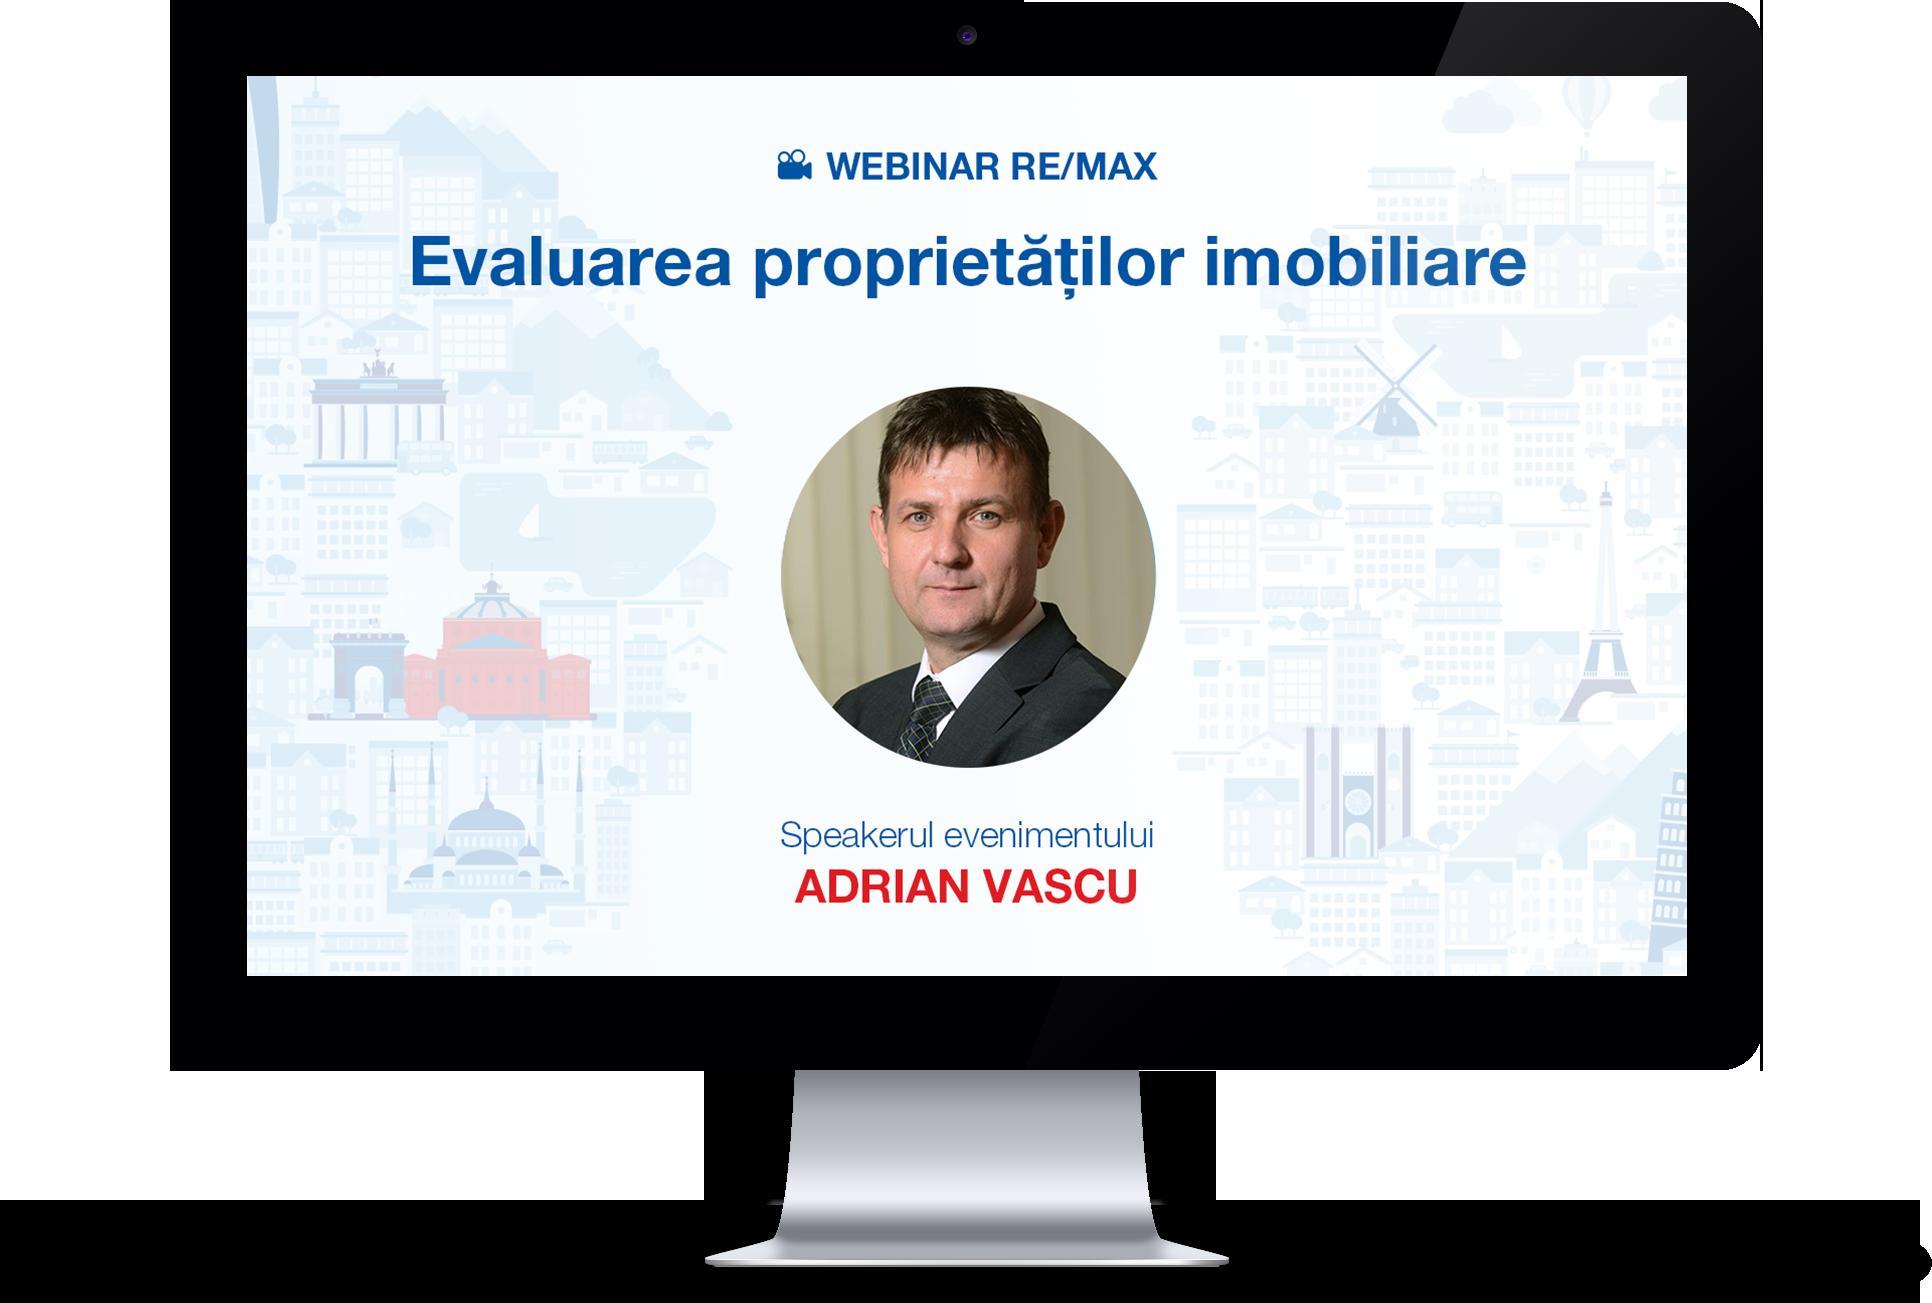 webinar-adrian-vascu-iMac-Mock-up-1